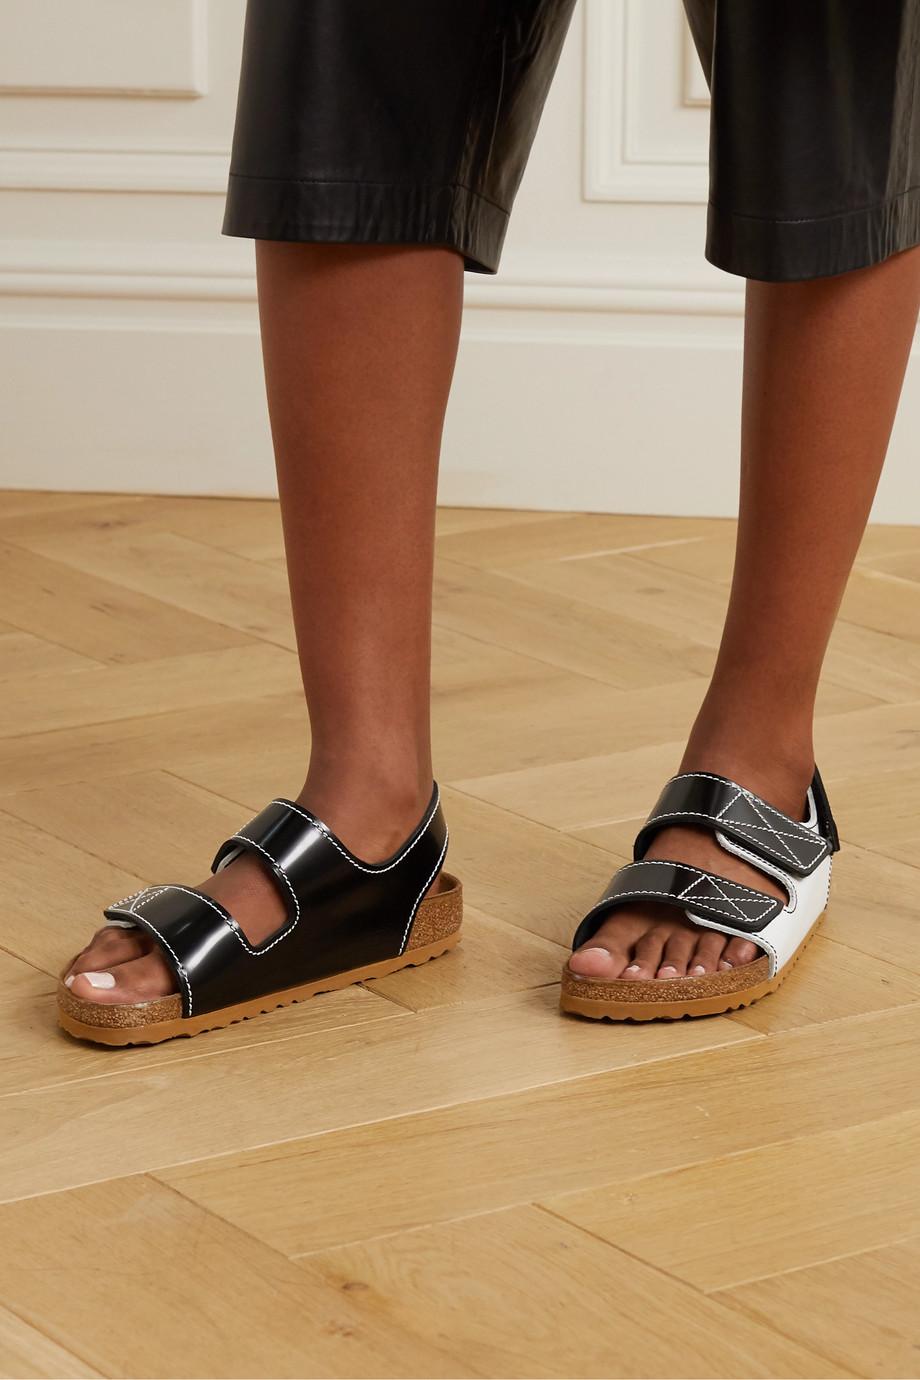 Proenza Schouler + Birkenstock Milano zweifarbige Slingback-Sandalen aus Glanzleder mit Kontrastnähten